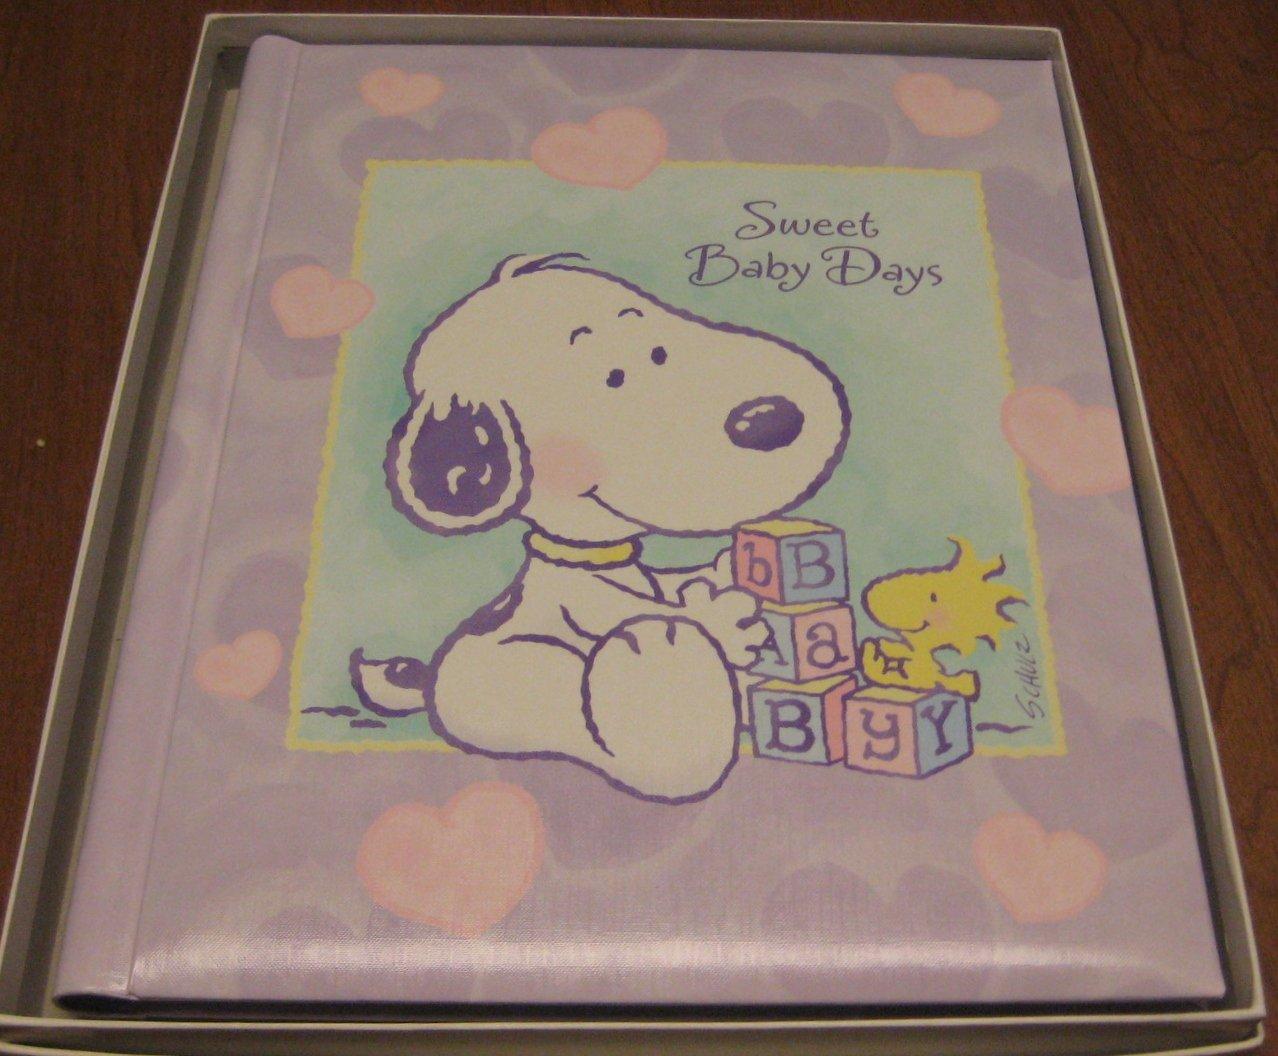 Hallmark Baby Snoopy Album - Sweet Baby Days - Keepsake Book